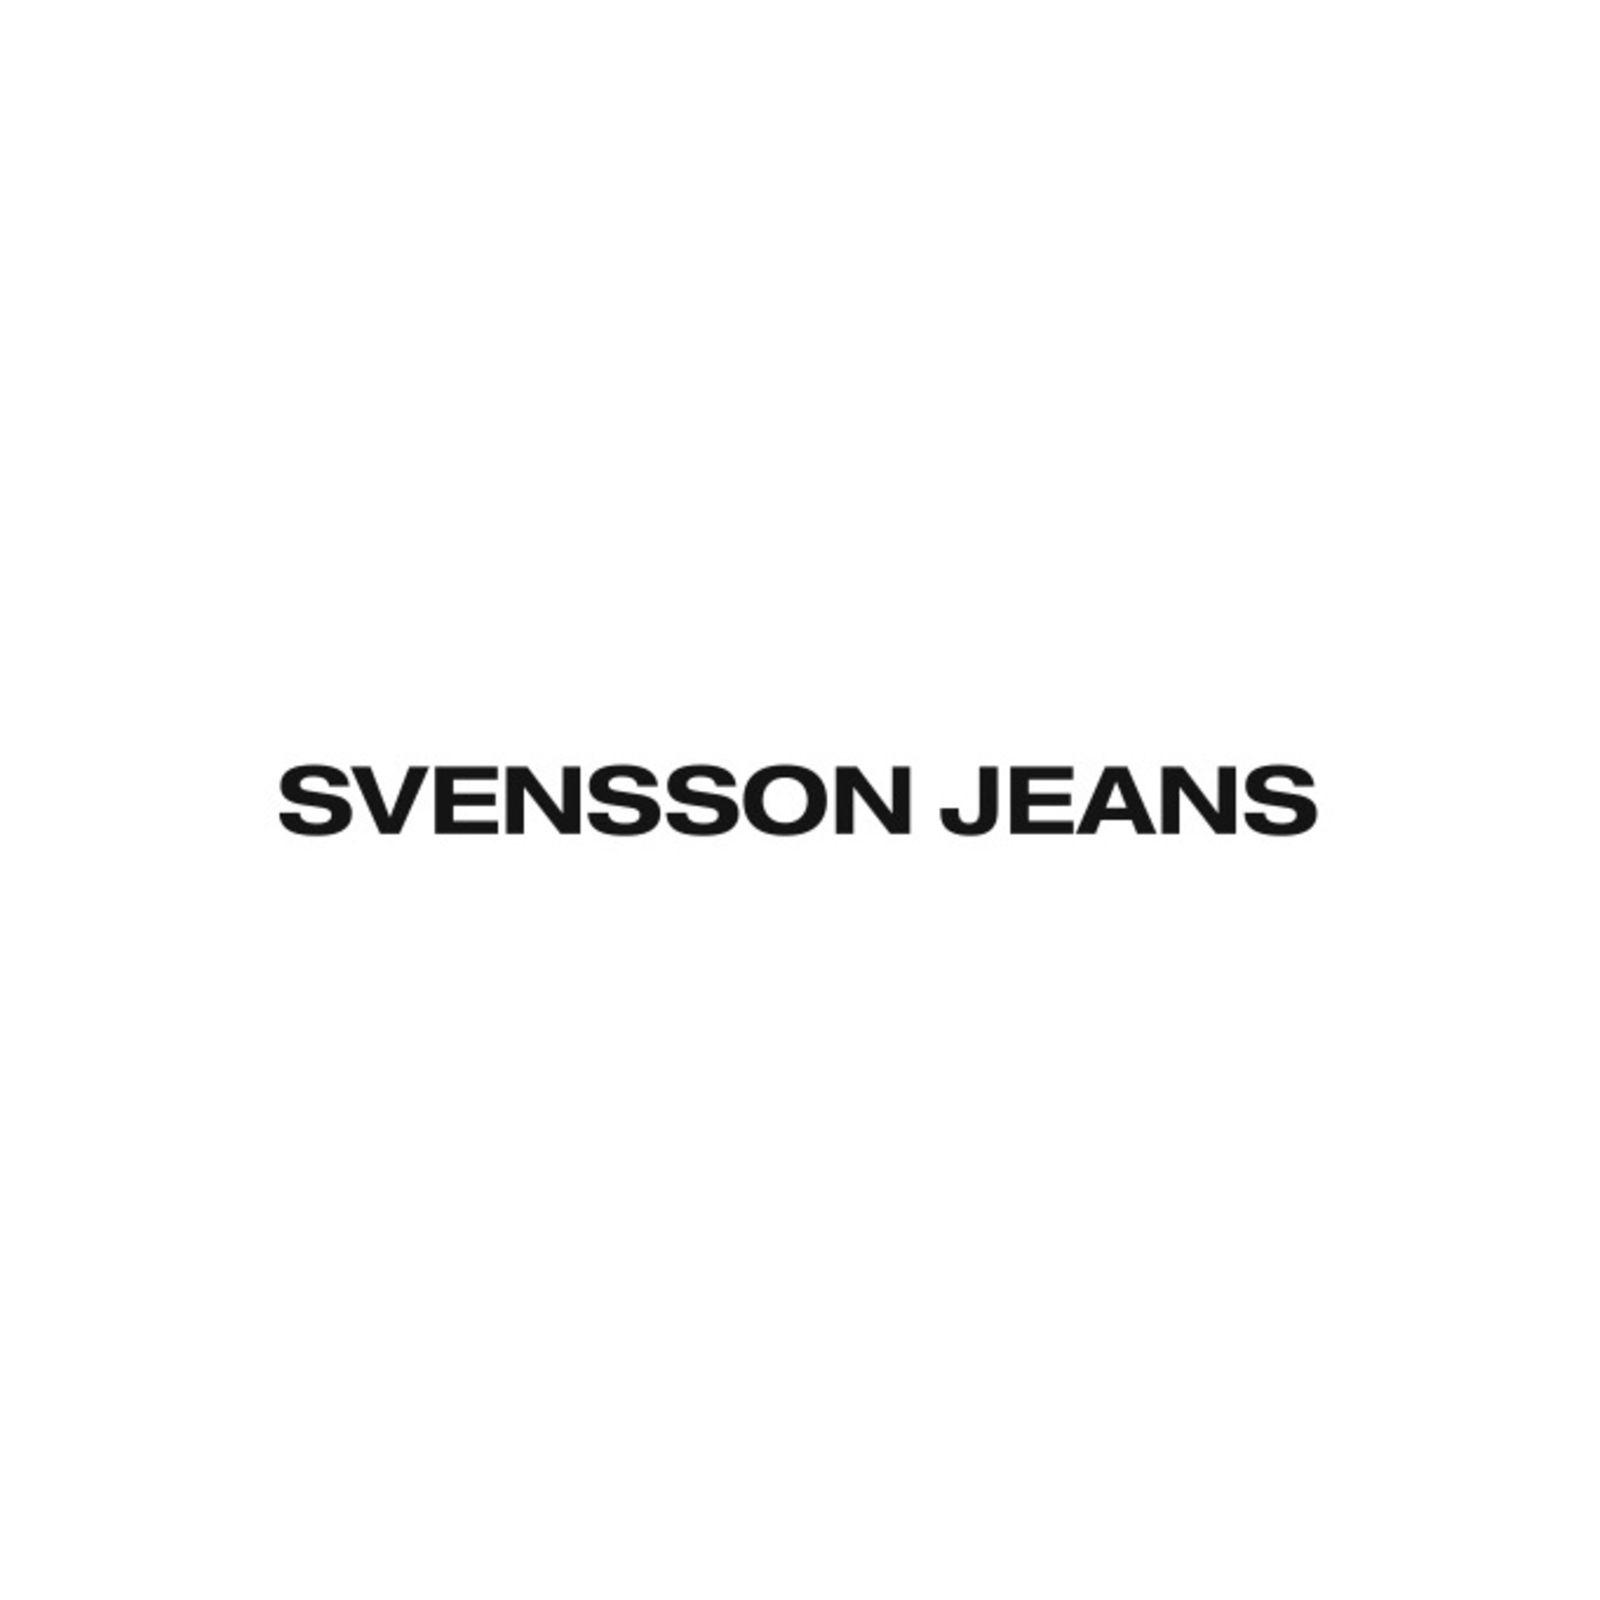 SVENSSON (Image 1)